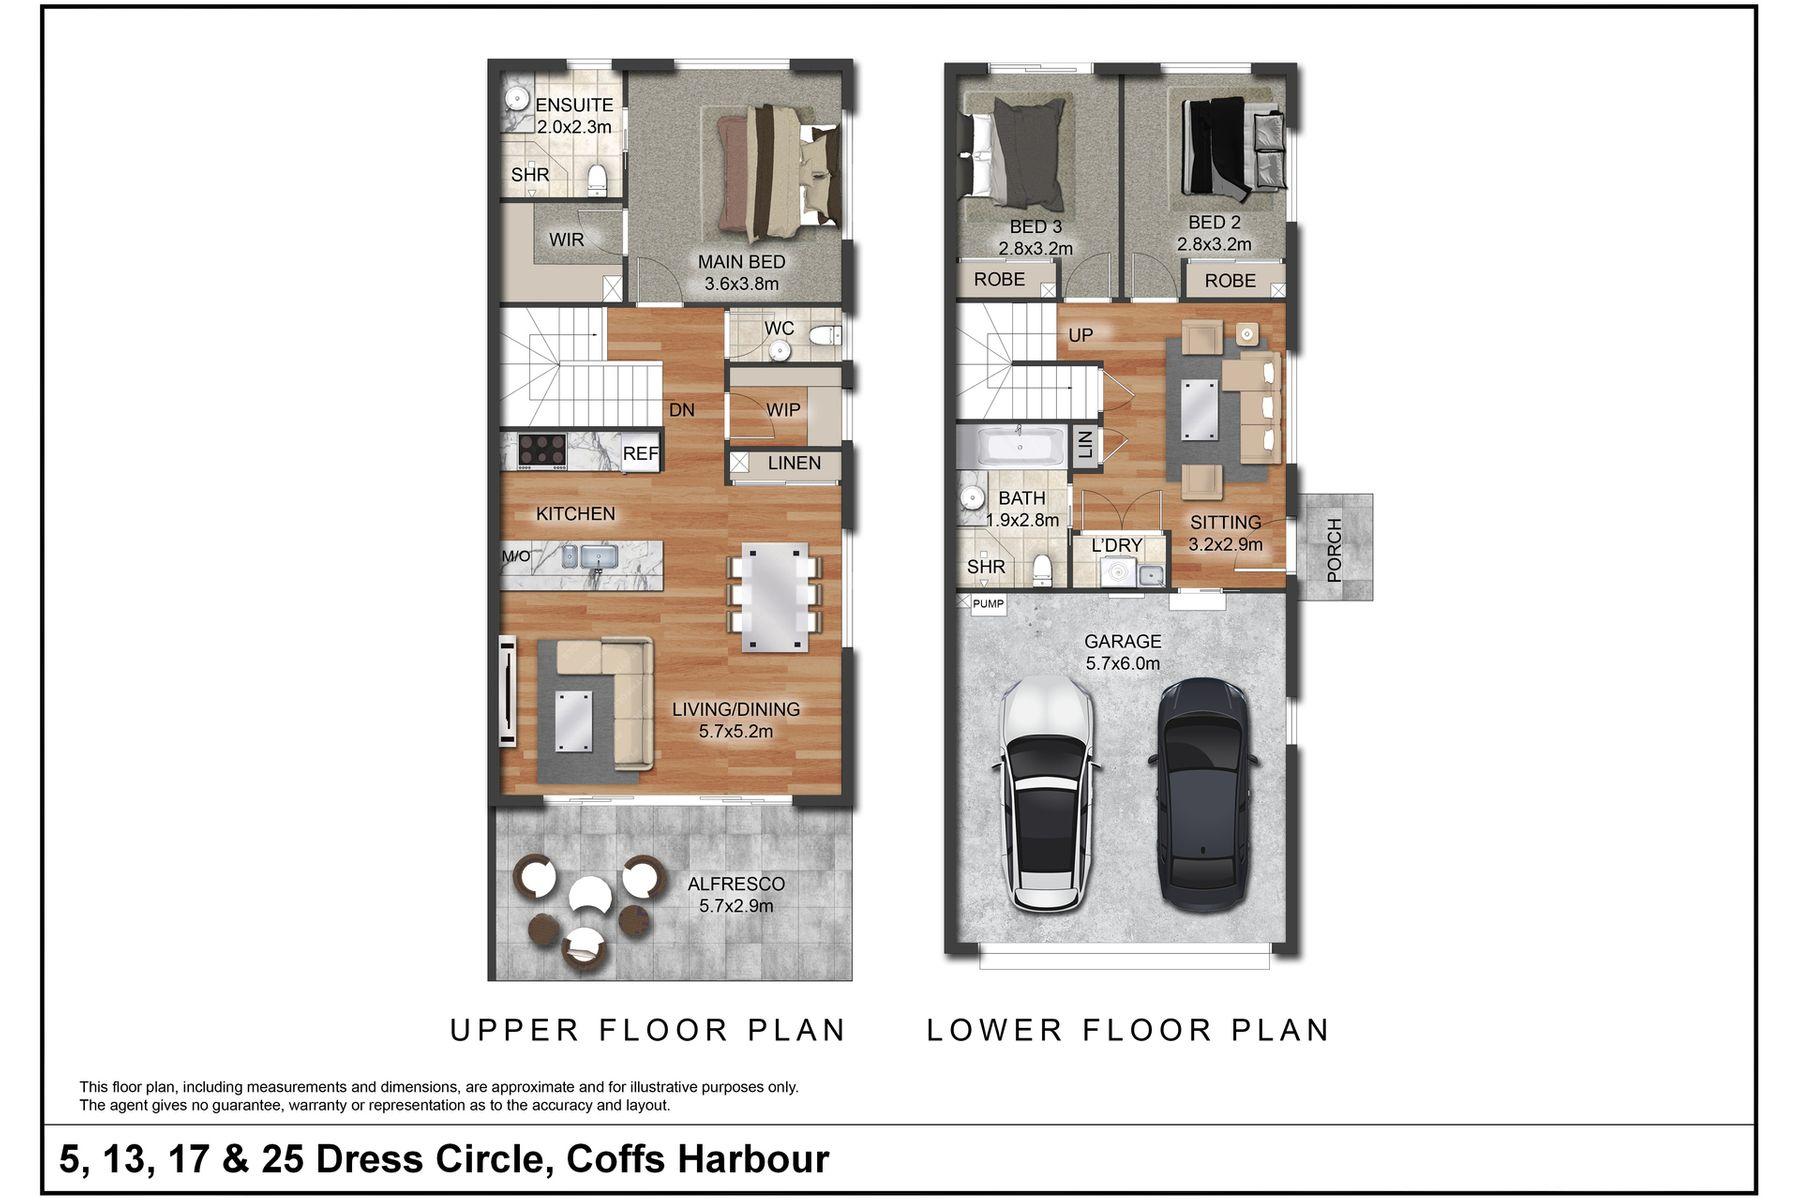 25 Dress Circle, Coffs Harbour, NSW 2450